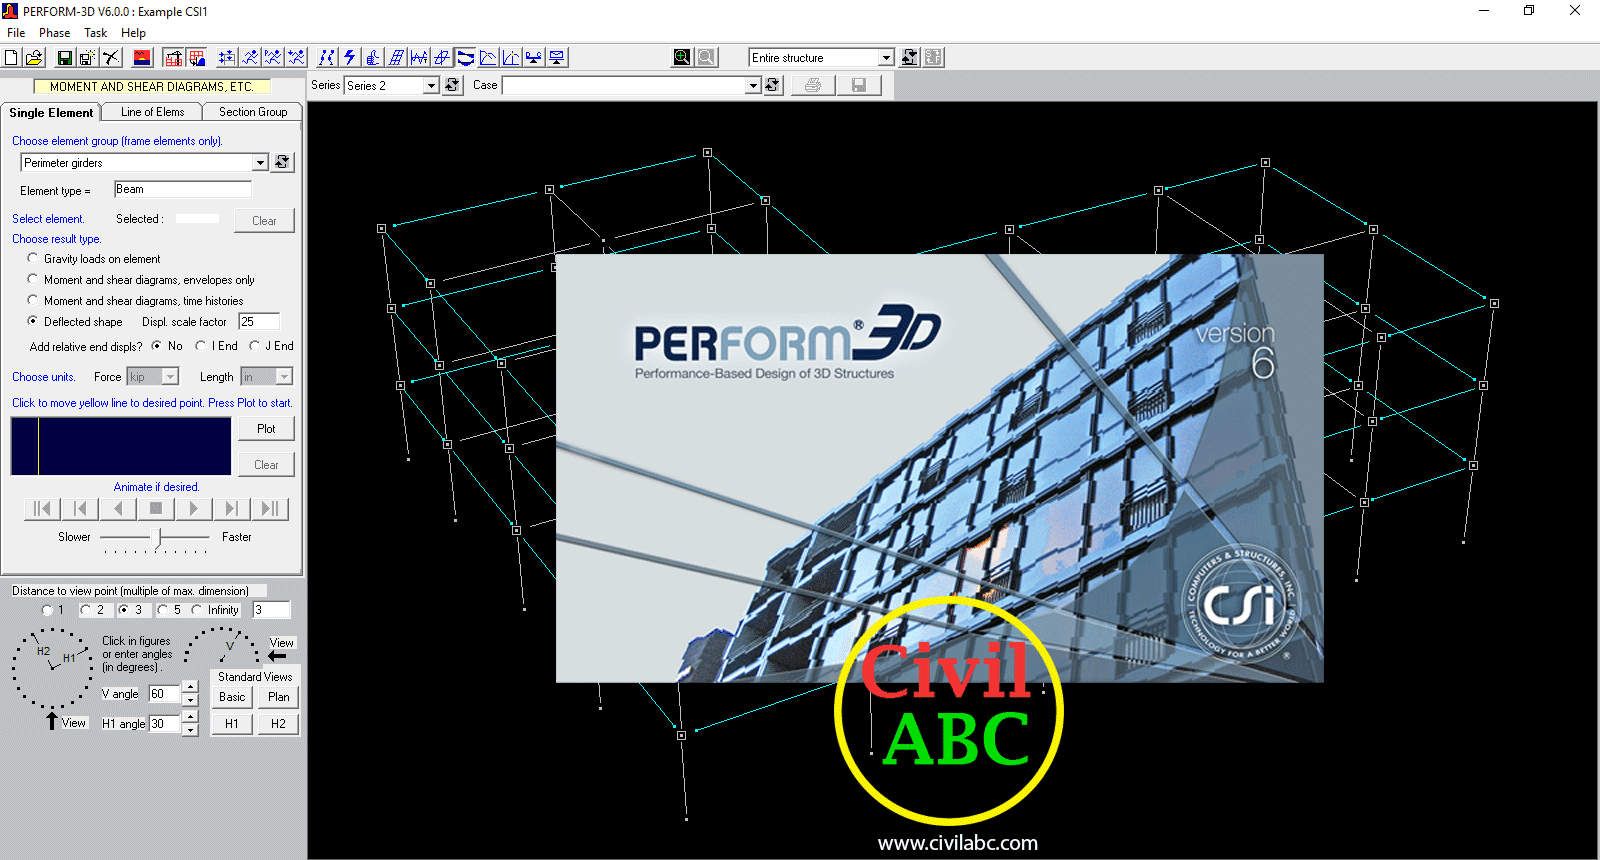 CSI PerForm-3D v6 0 0 (x86/x64) Free Download - Civil